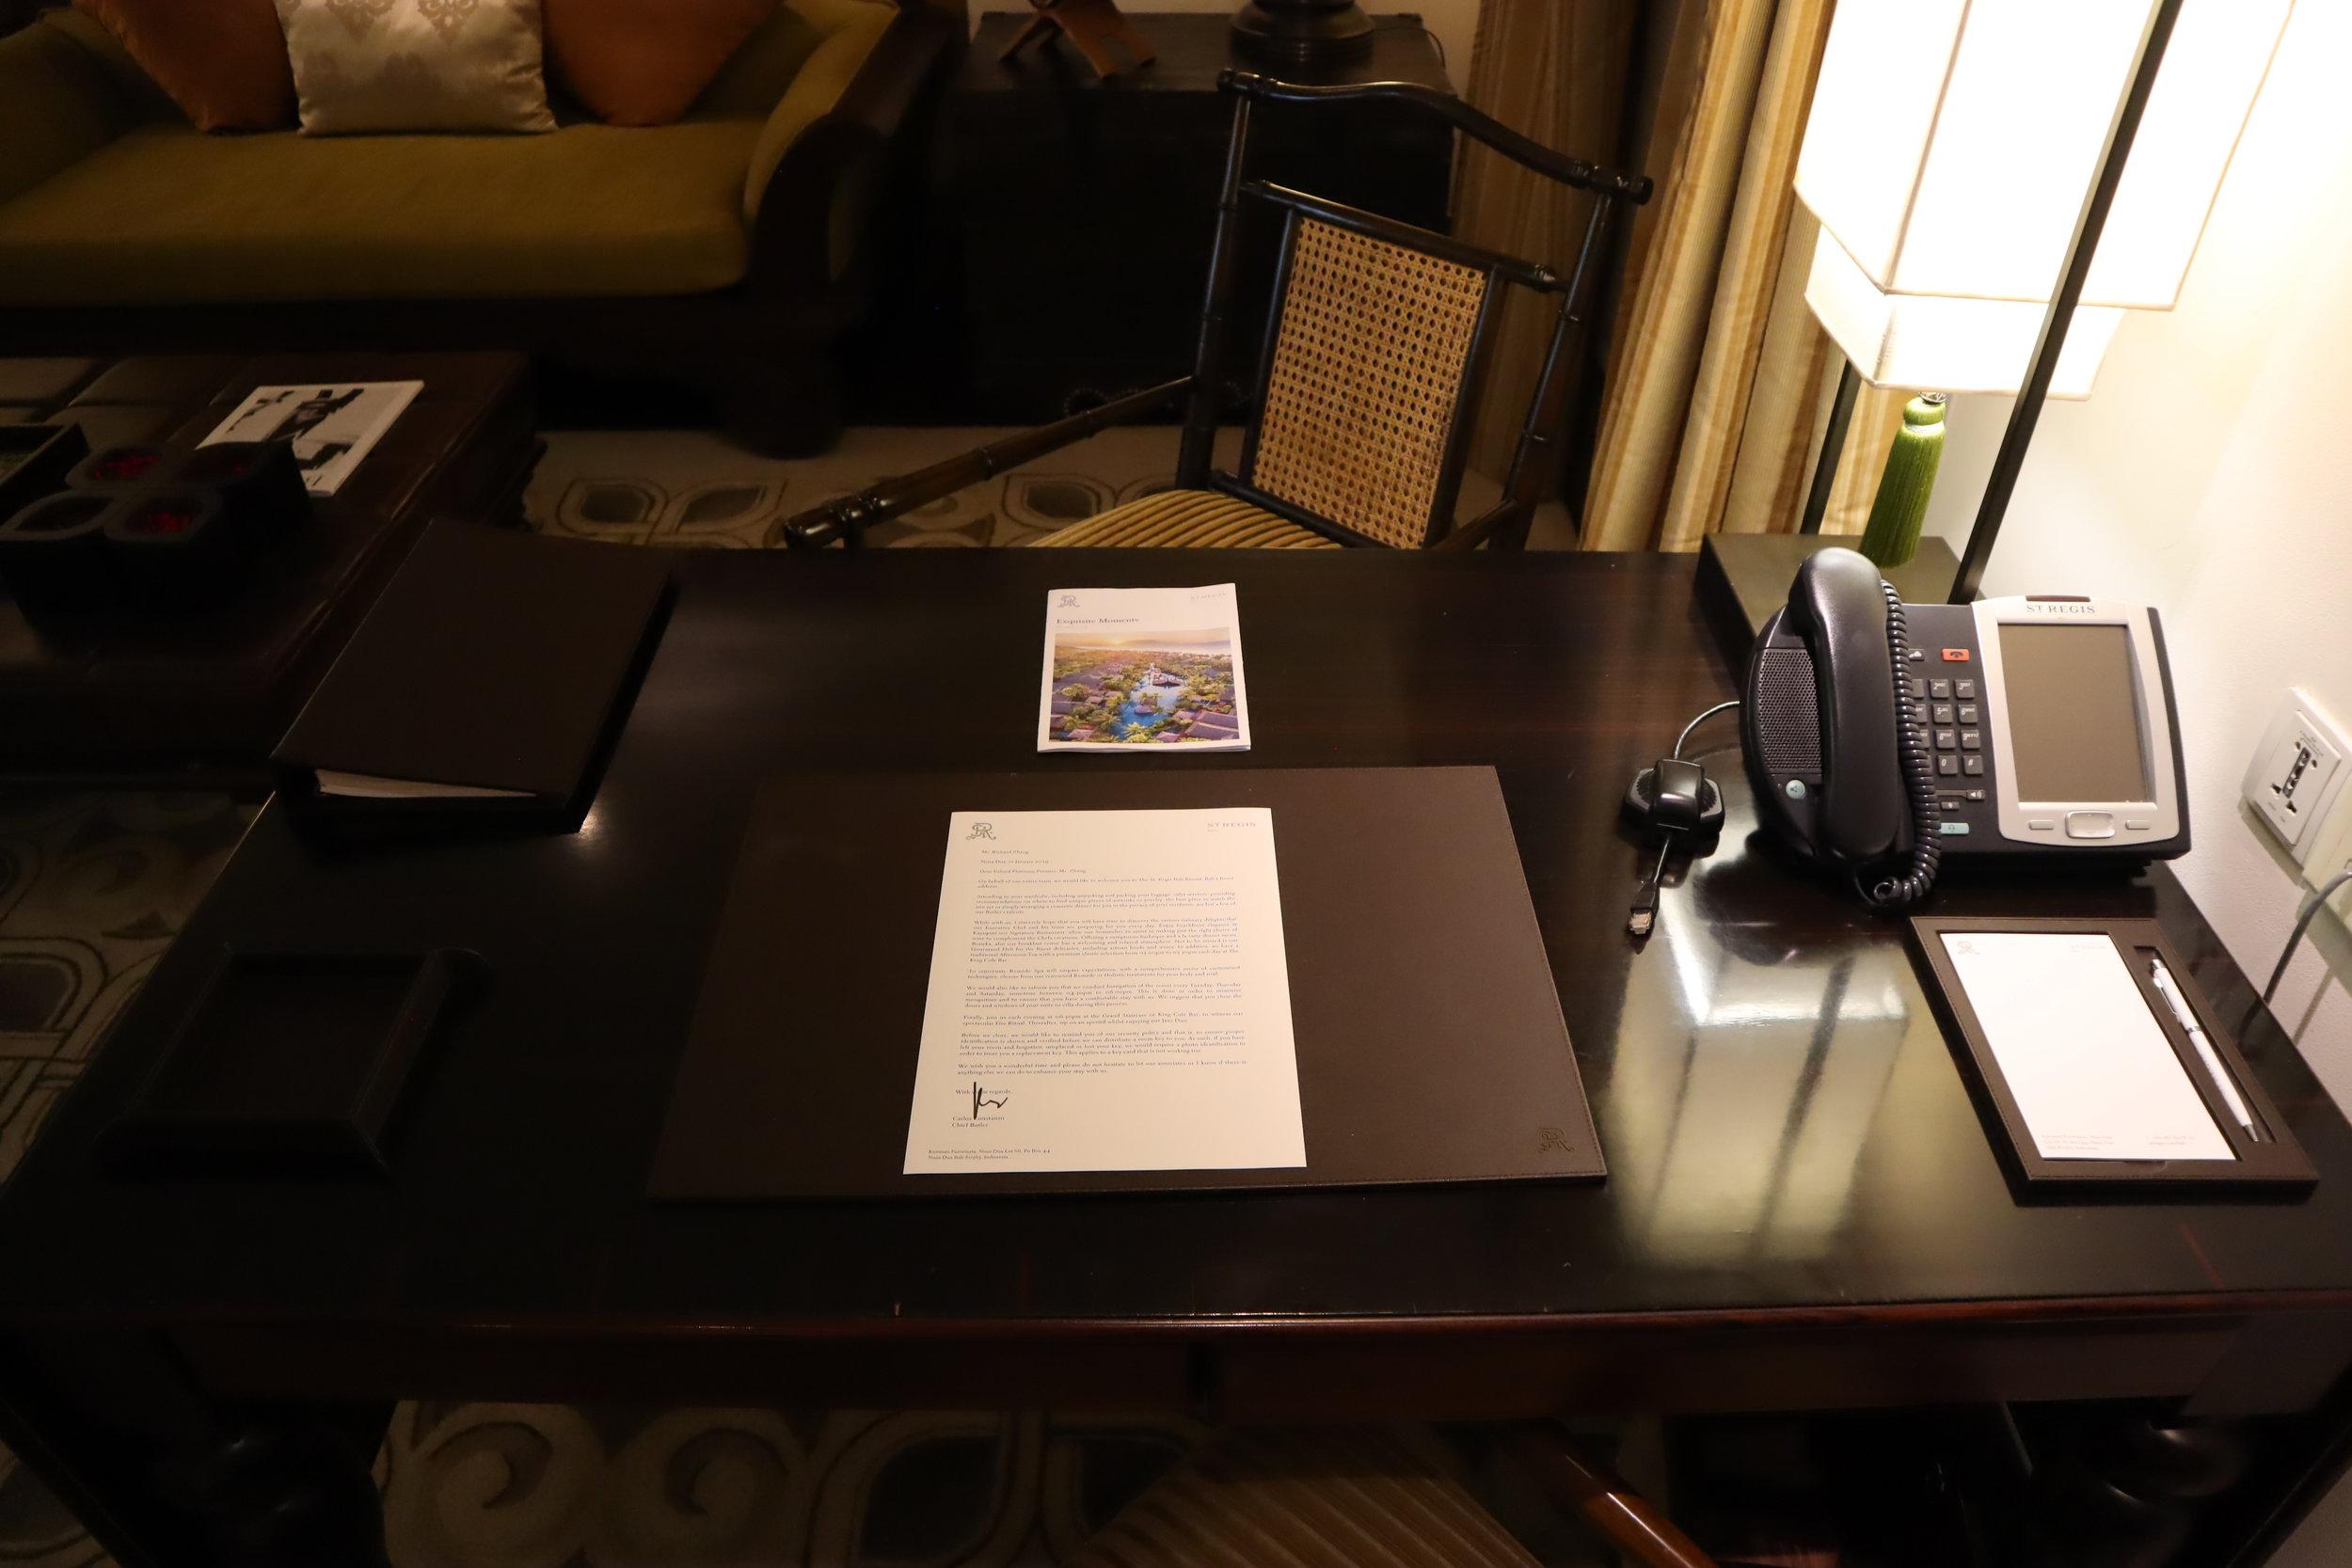 St. Regis Bali – St. Regis Pool Suite desk